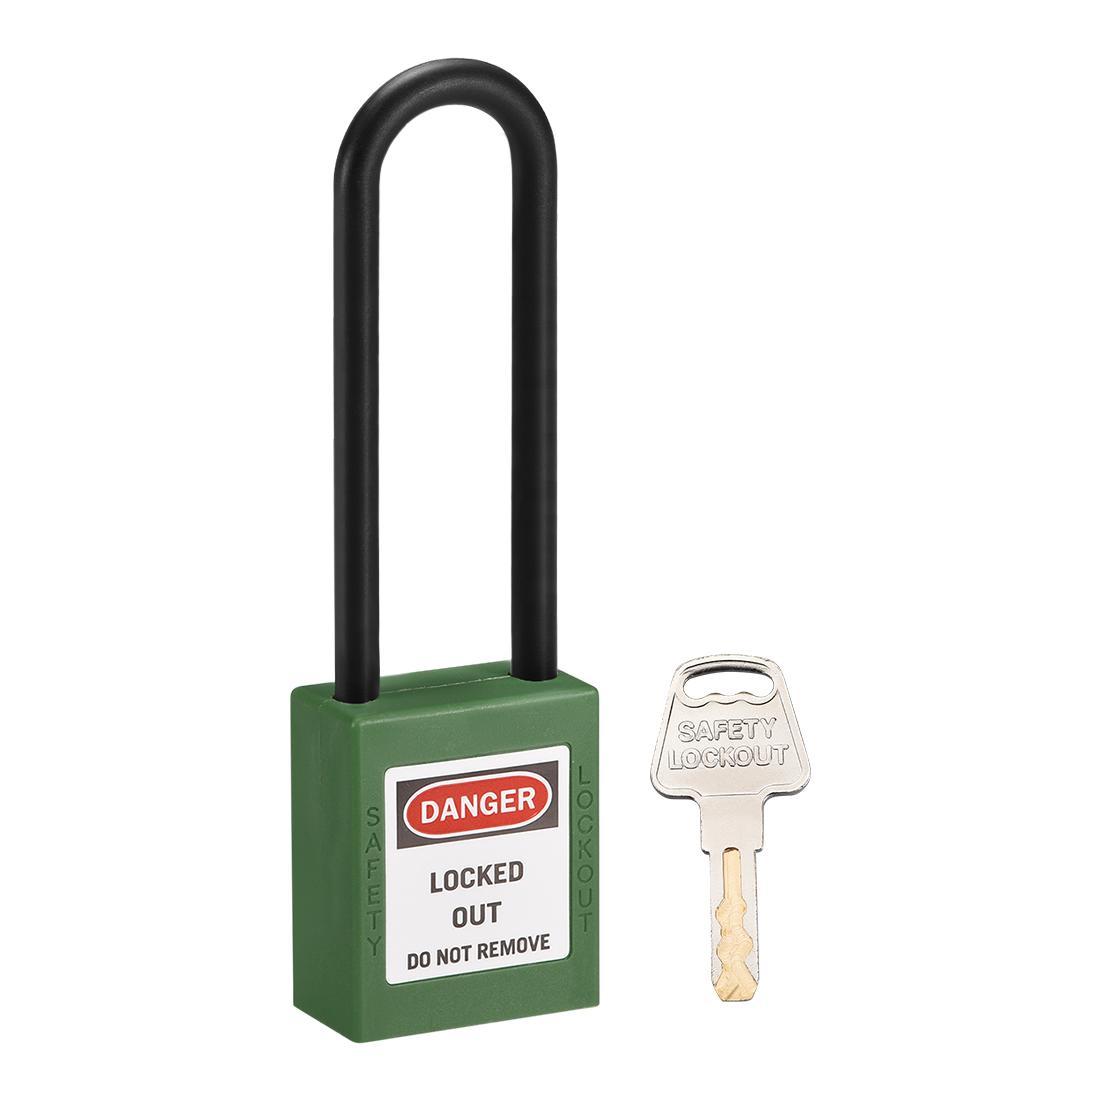 Lockout Tagout Locks 3 Inch Shackle Key Alike Safety Padlock Plastic Lock Green